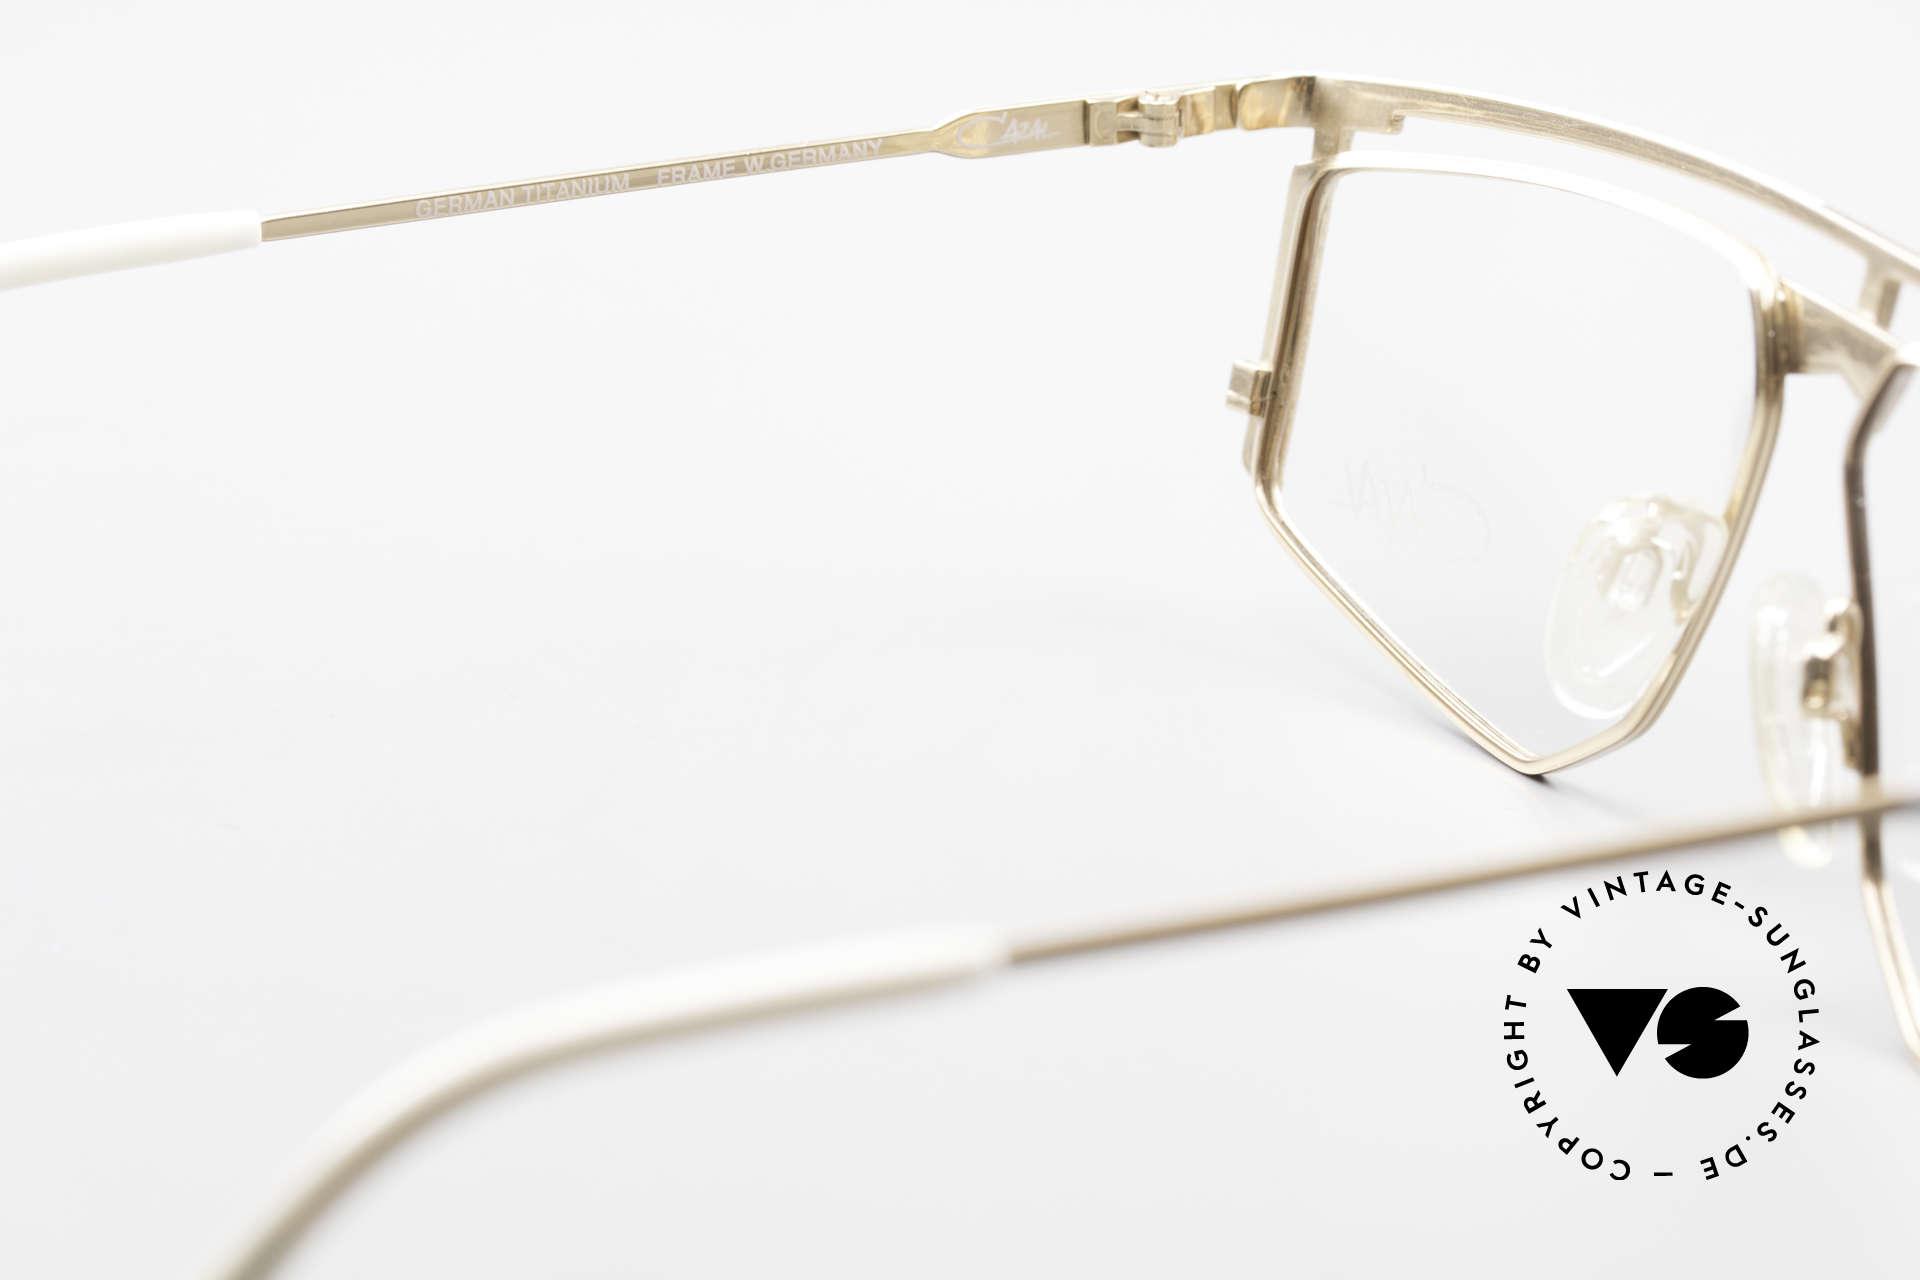 Cazal 235 Titanium Vintage Cazal Frame, the frame fits optical lenses or tinted lenses optionally, Made for Men and Women